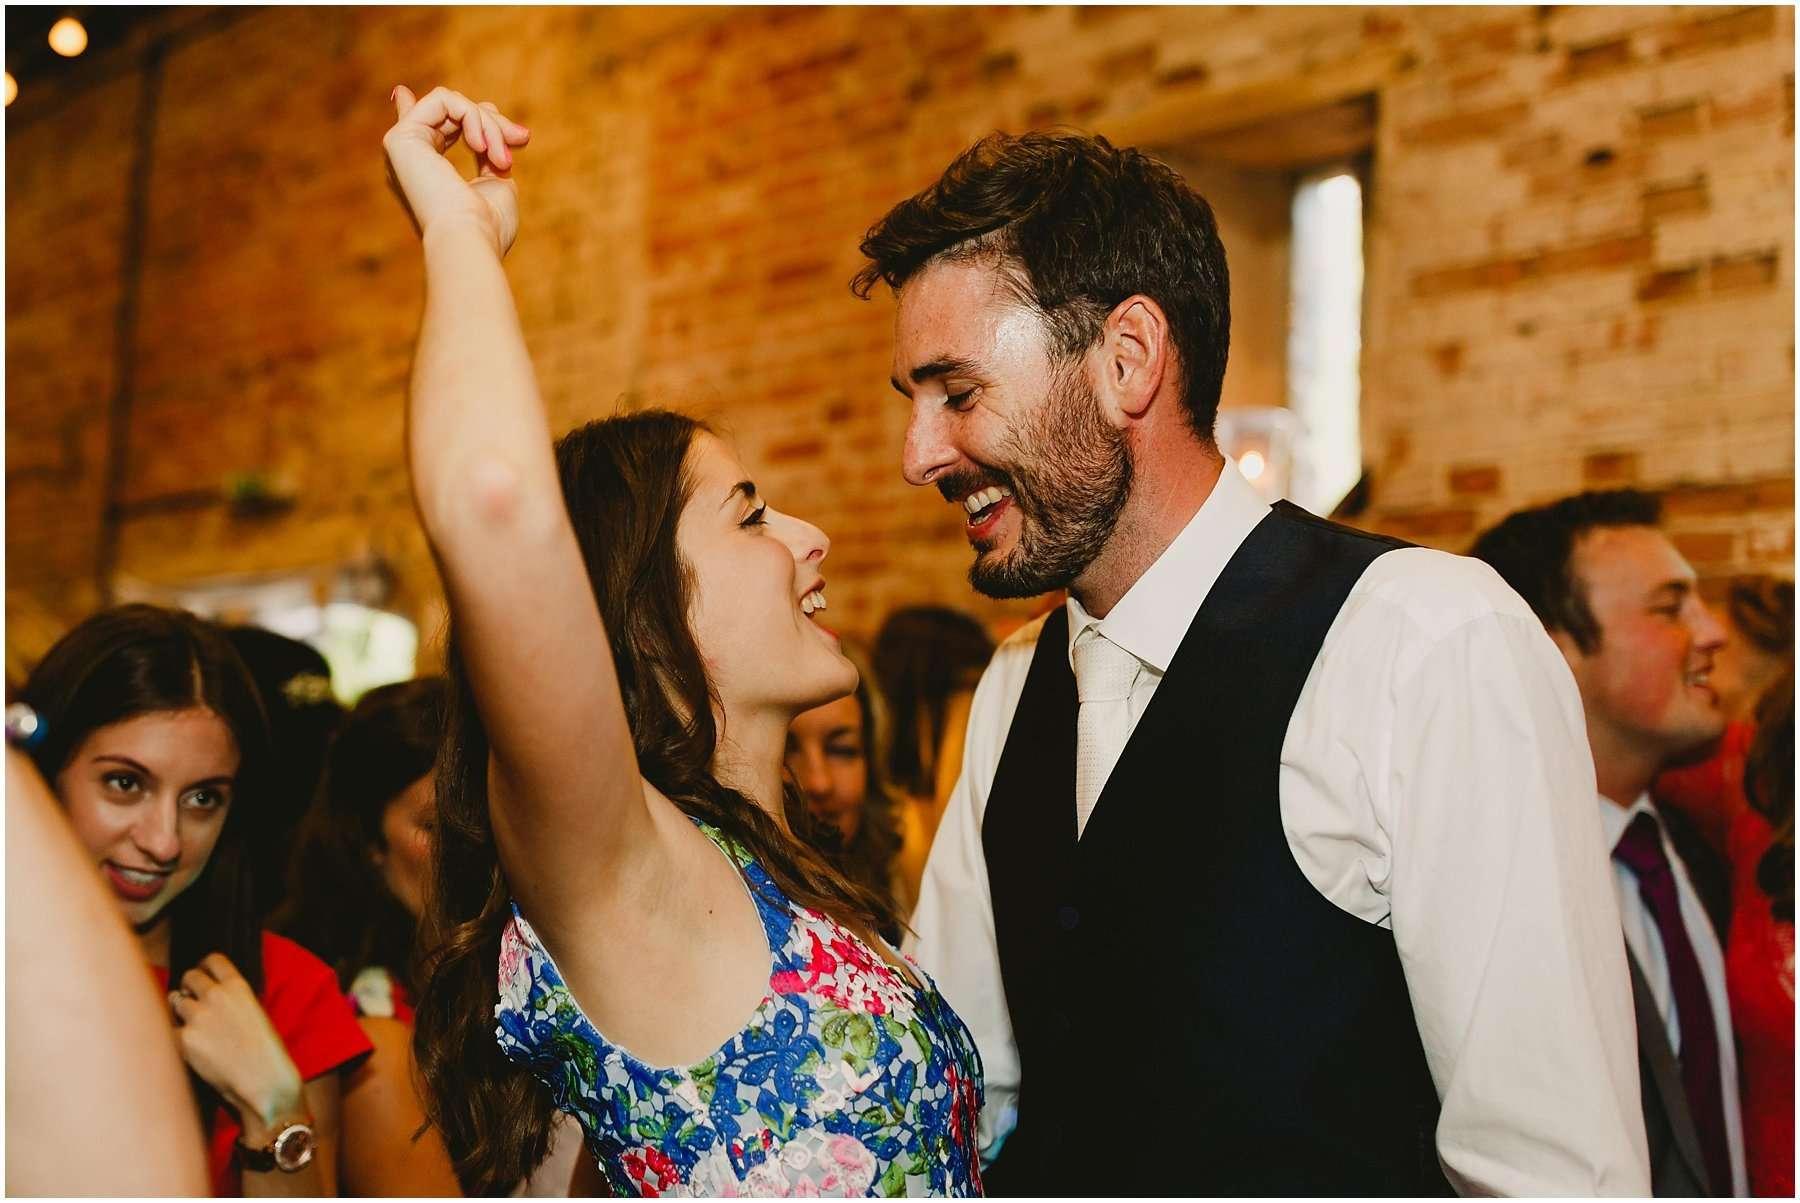 Spixworth Hall Cottages Wedding Photographer